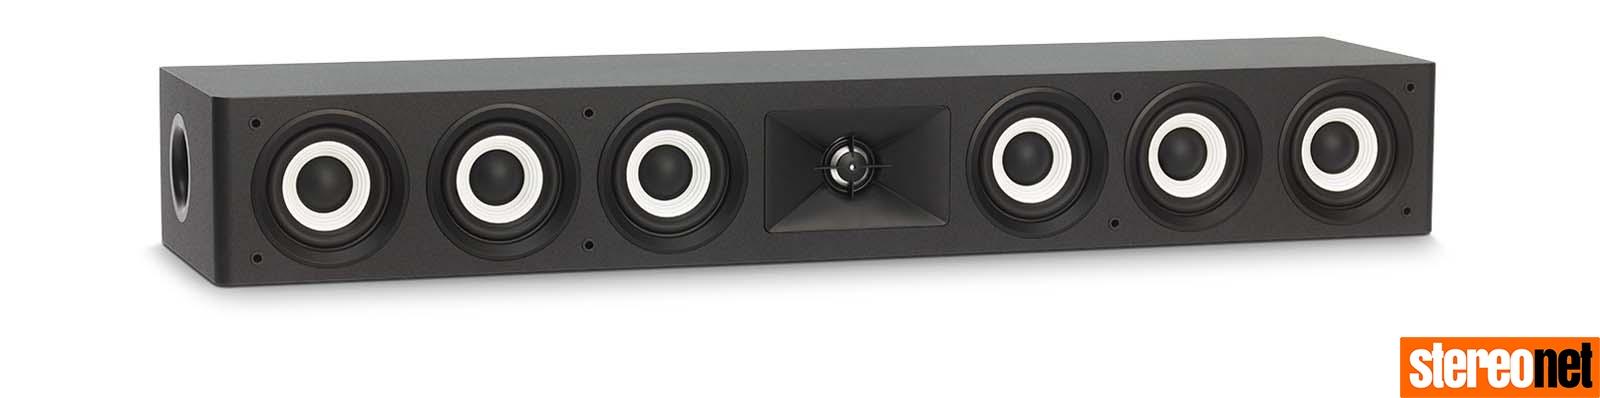 JBL Stage 5 1 Surround Sound Loudspeaker Pack Review